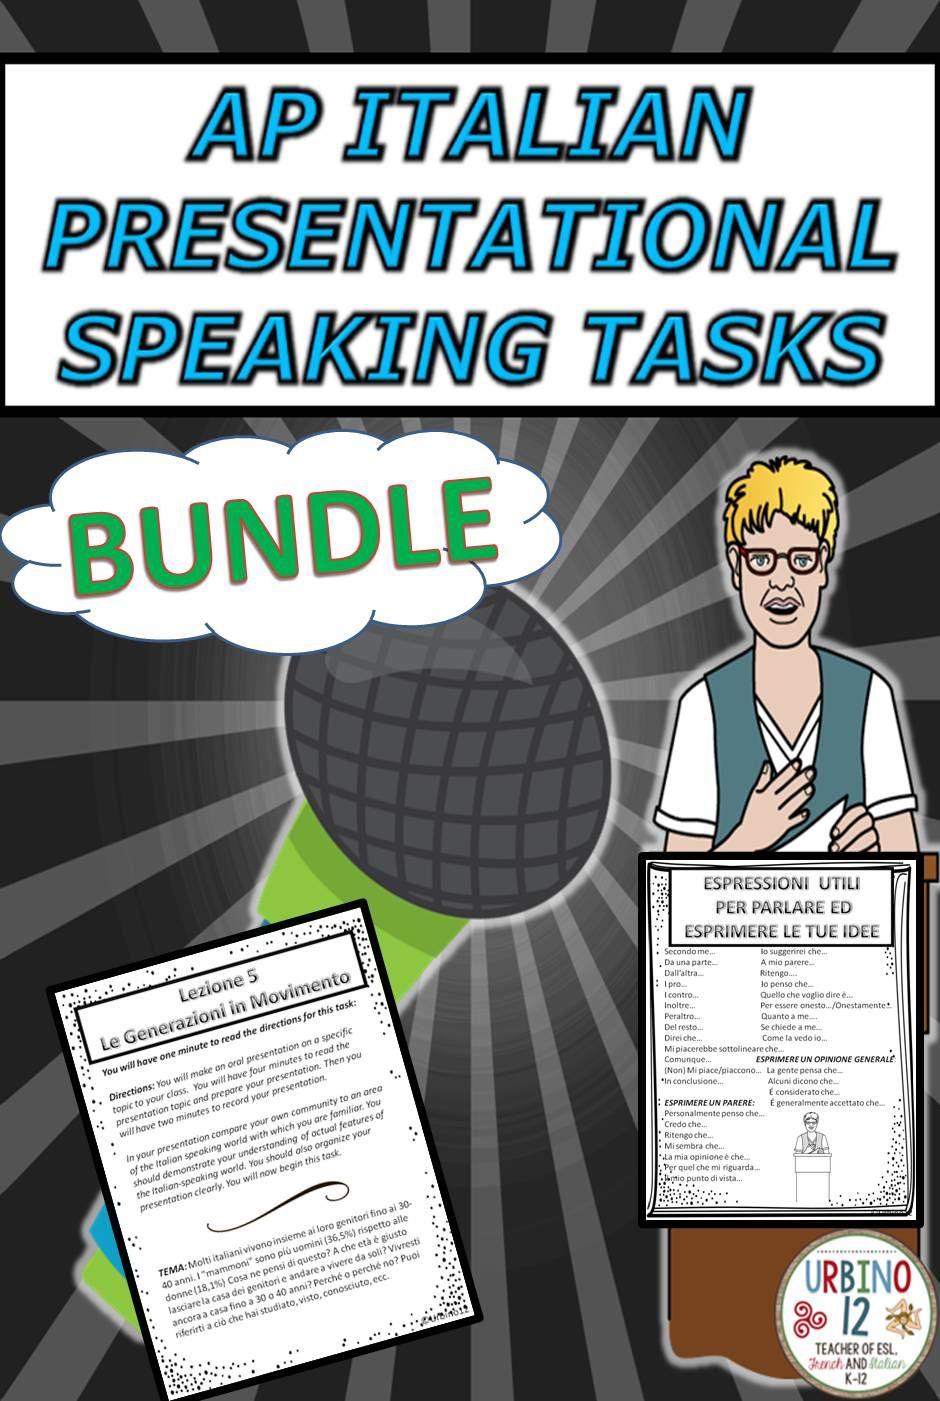 AP Italian Presentational Speaking Tasks BUNDLE | AP Italian and